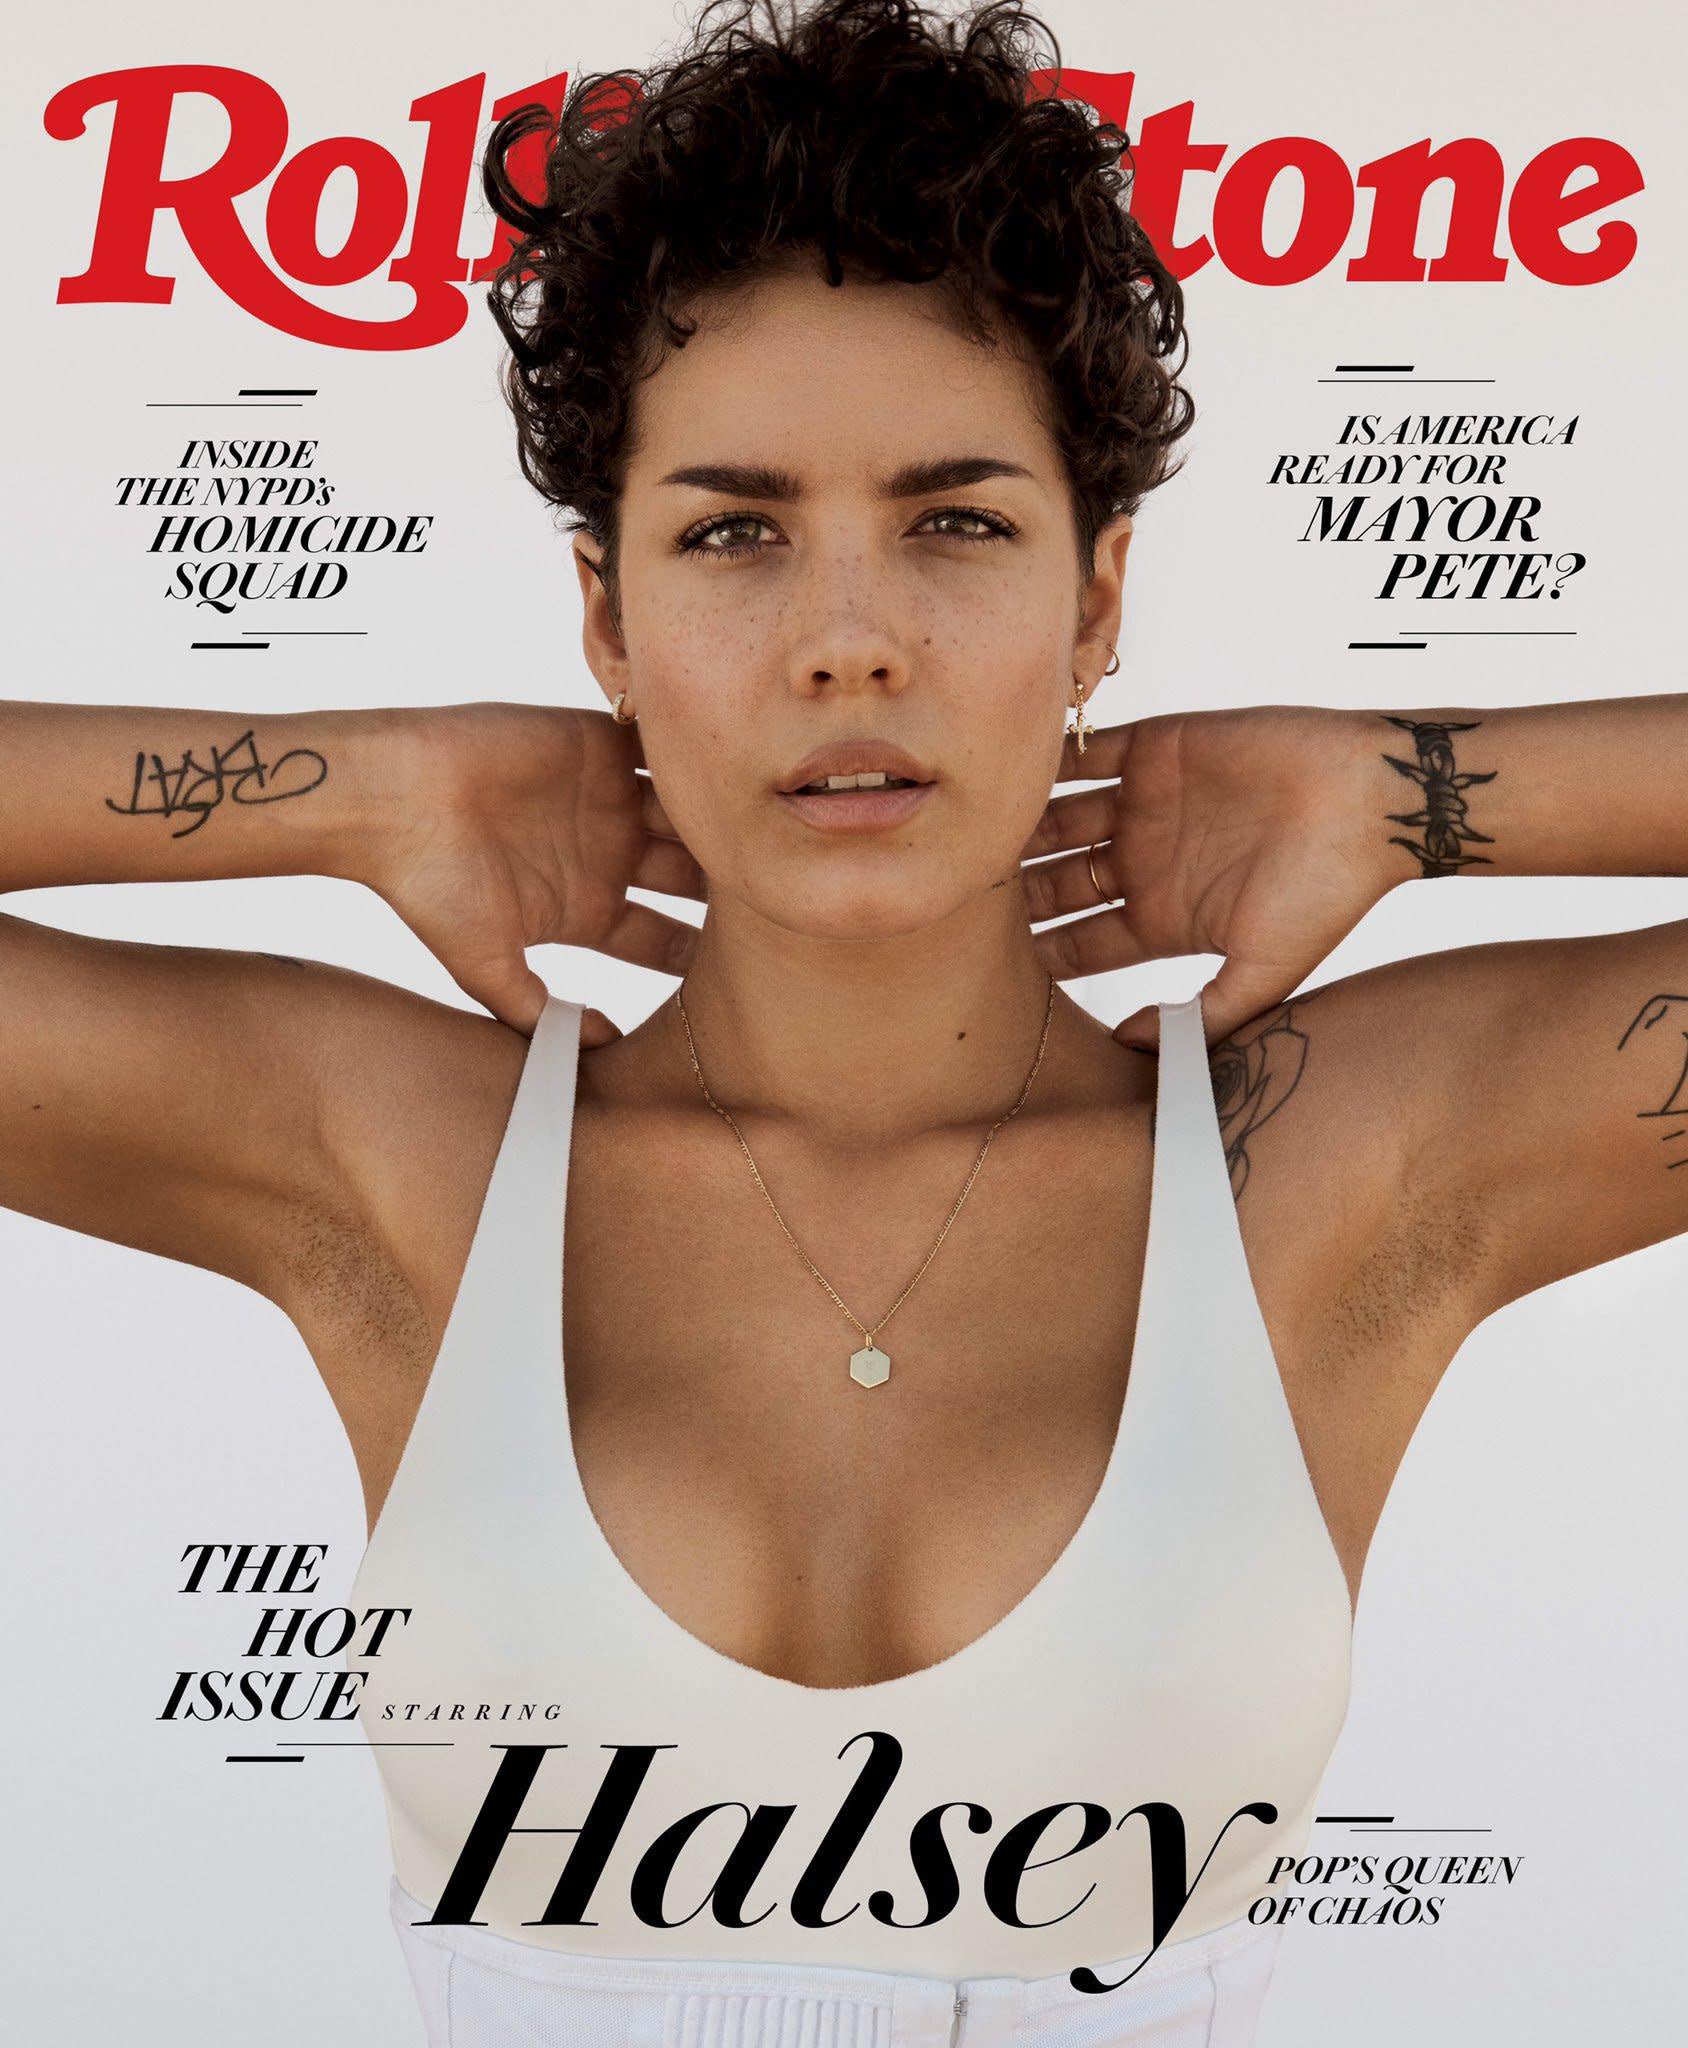 separation shoes 22034 c493e Demi Lovato Praises Halsey's Rolling Stone Cover as Singer Receives  Backlash for Unshaven Armpits